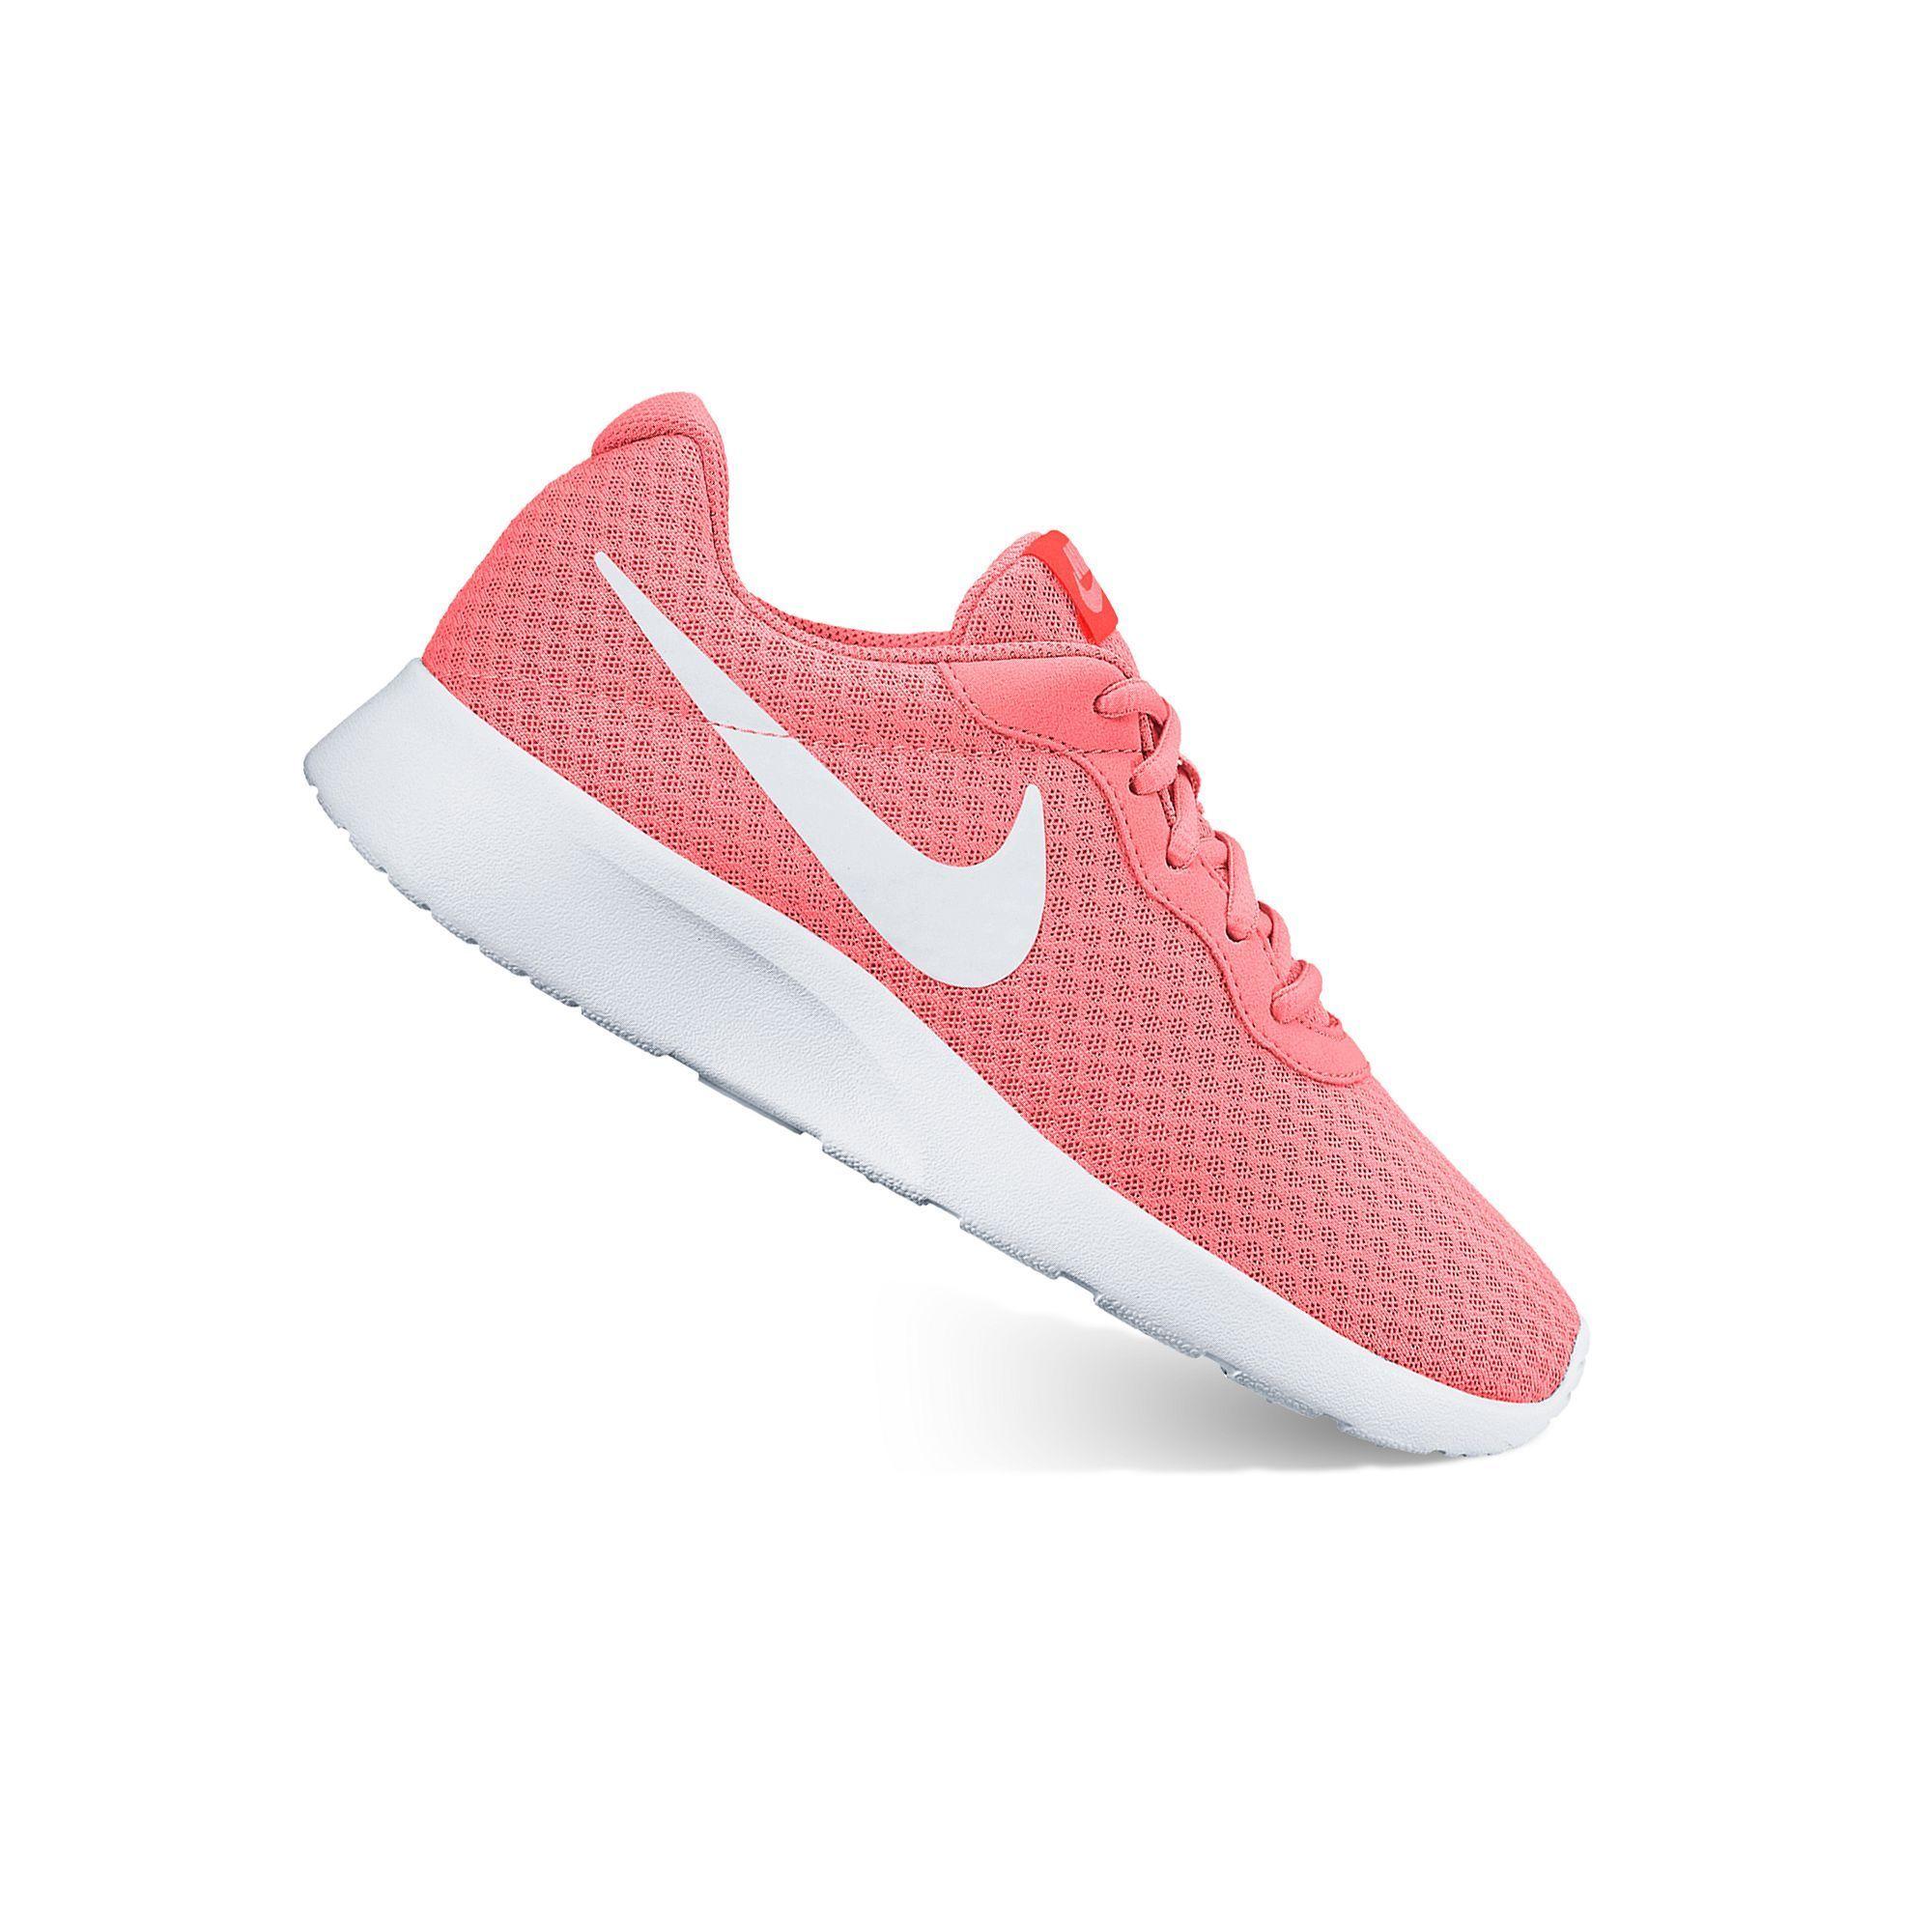 9421b9be8 ... get nike tanjun womens athletic shoes size 9.5 white 5d3d0 450ba